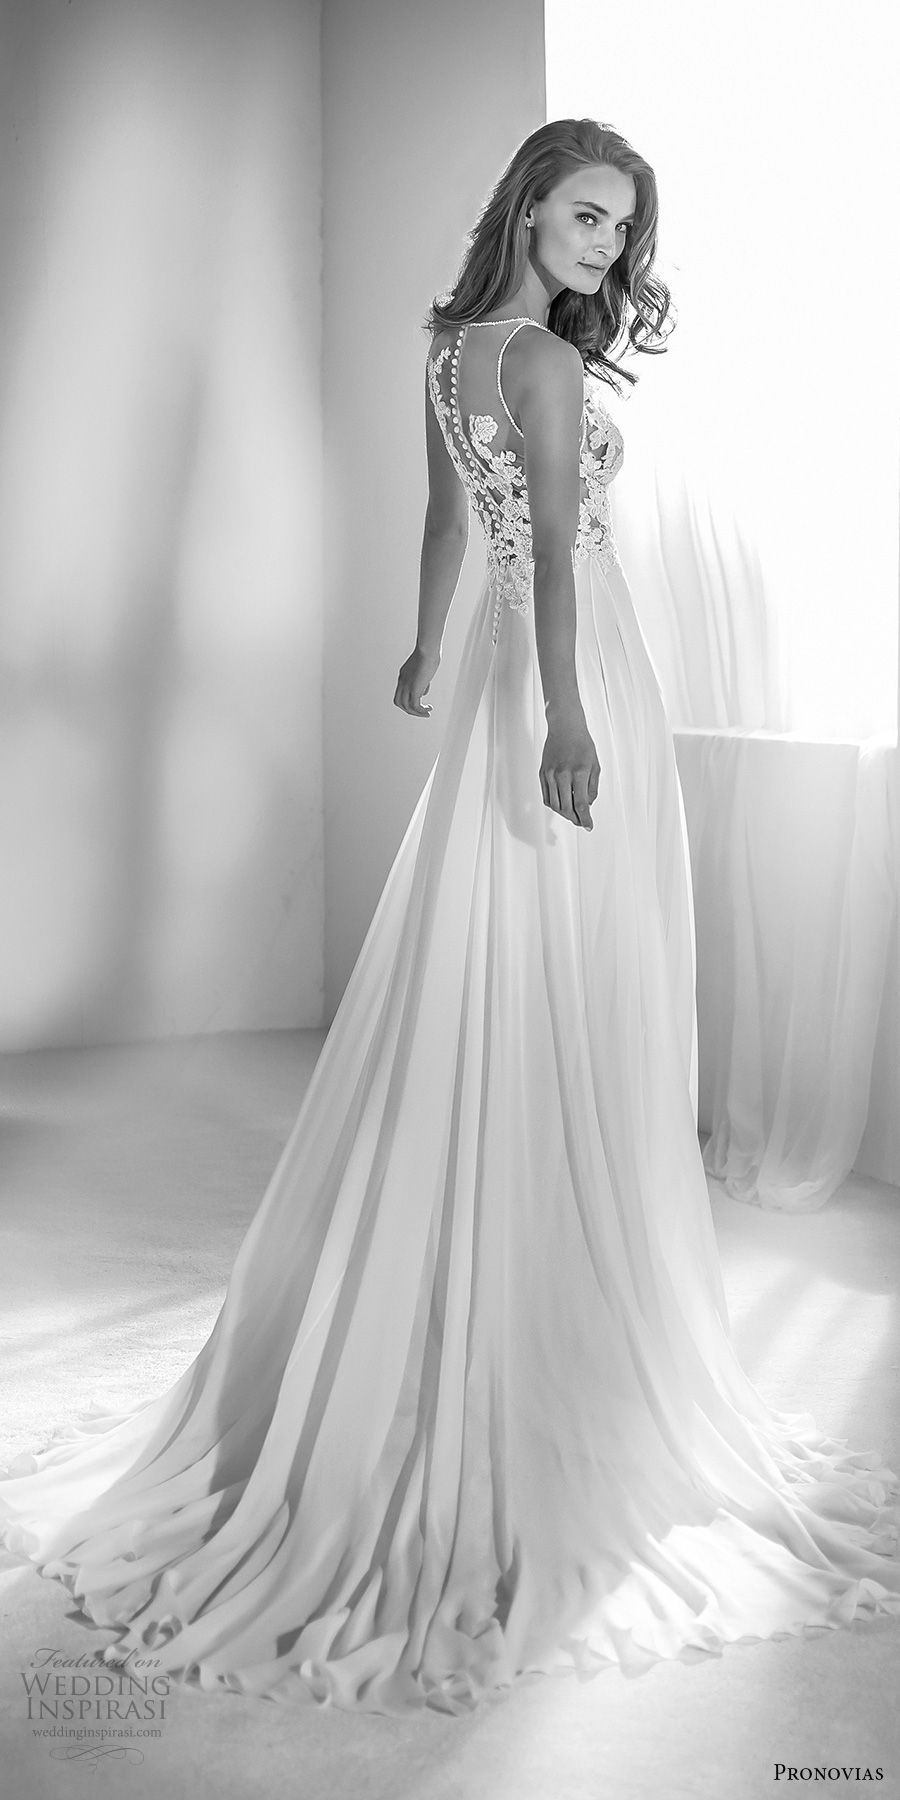 Atelier Pronovias 2018 Brautkleider | Pinterest | Brautkleid ...